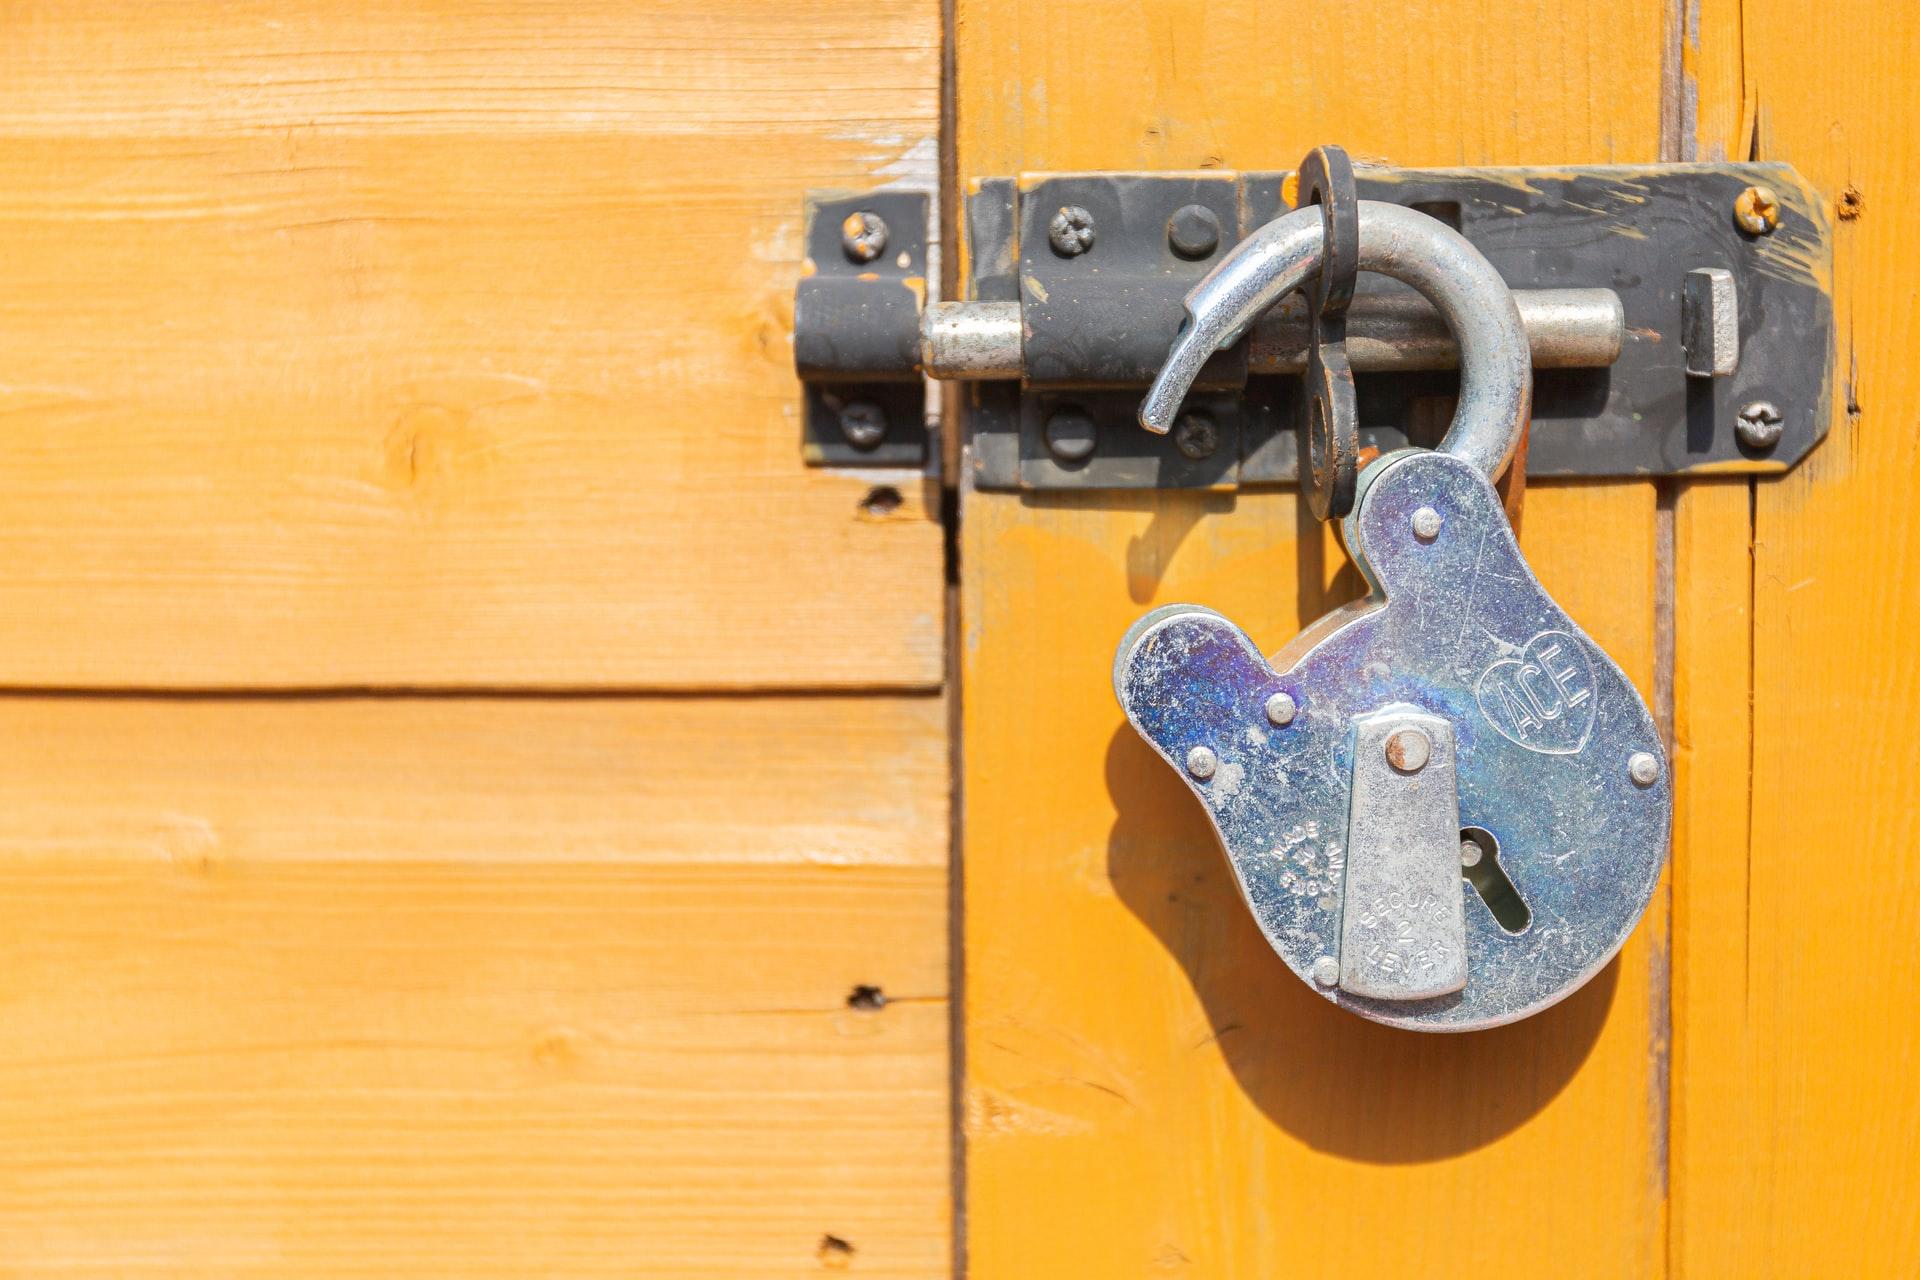 Unlocked padlock on yellow background